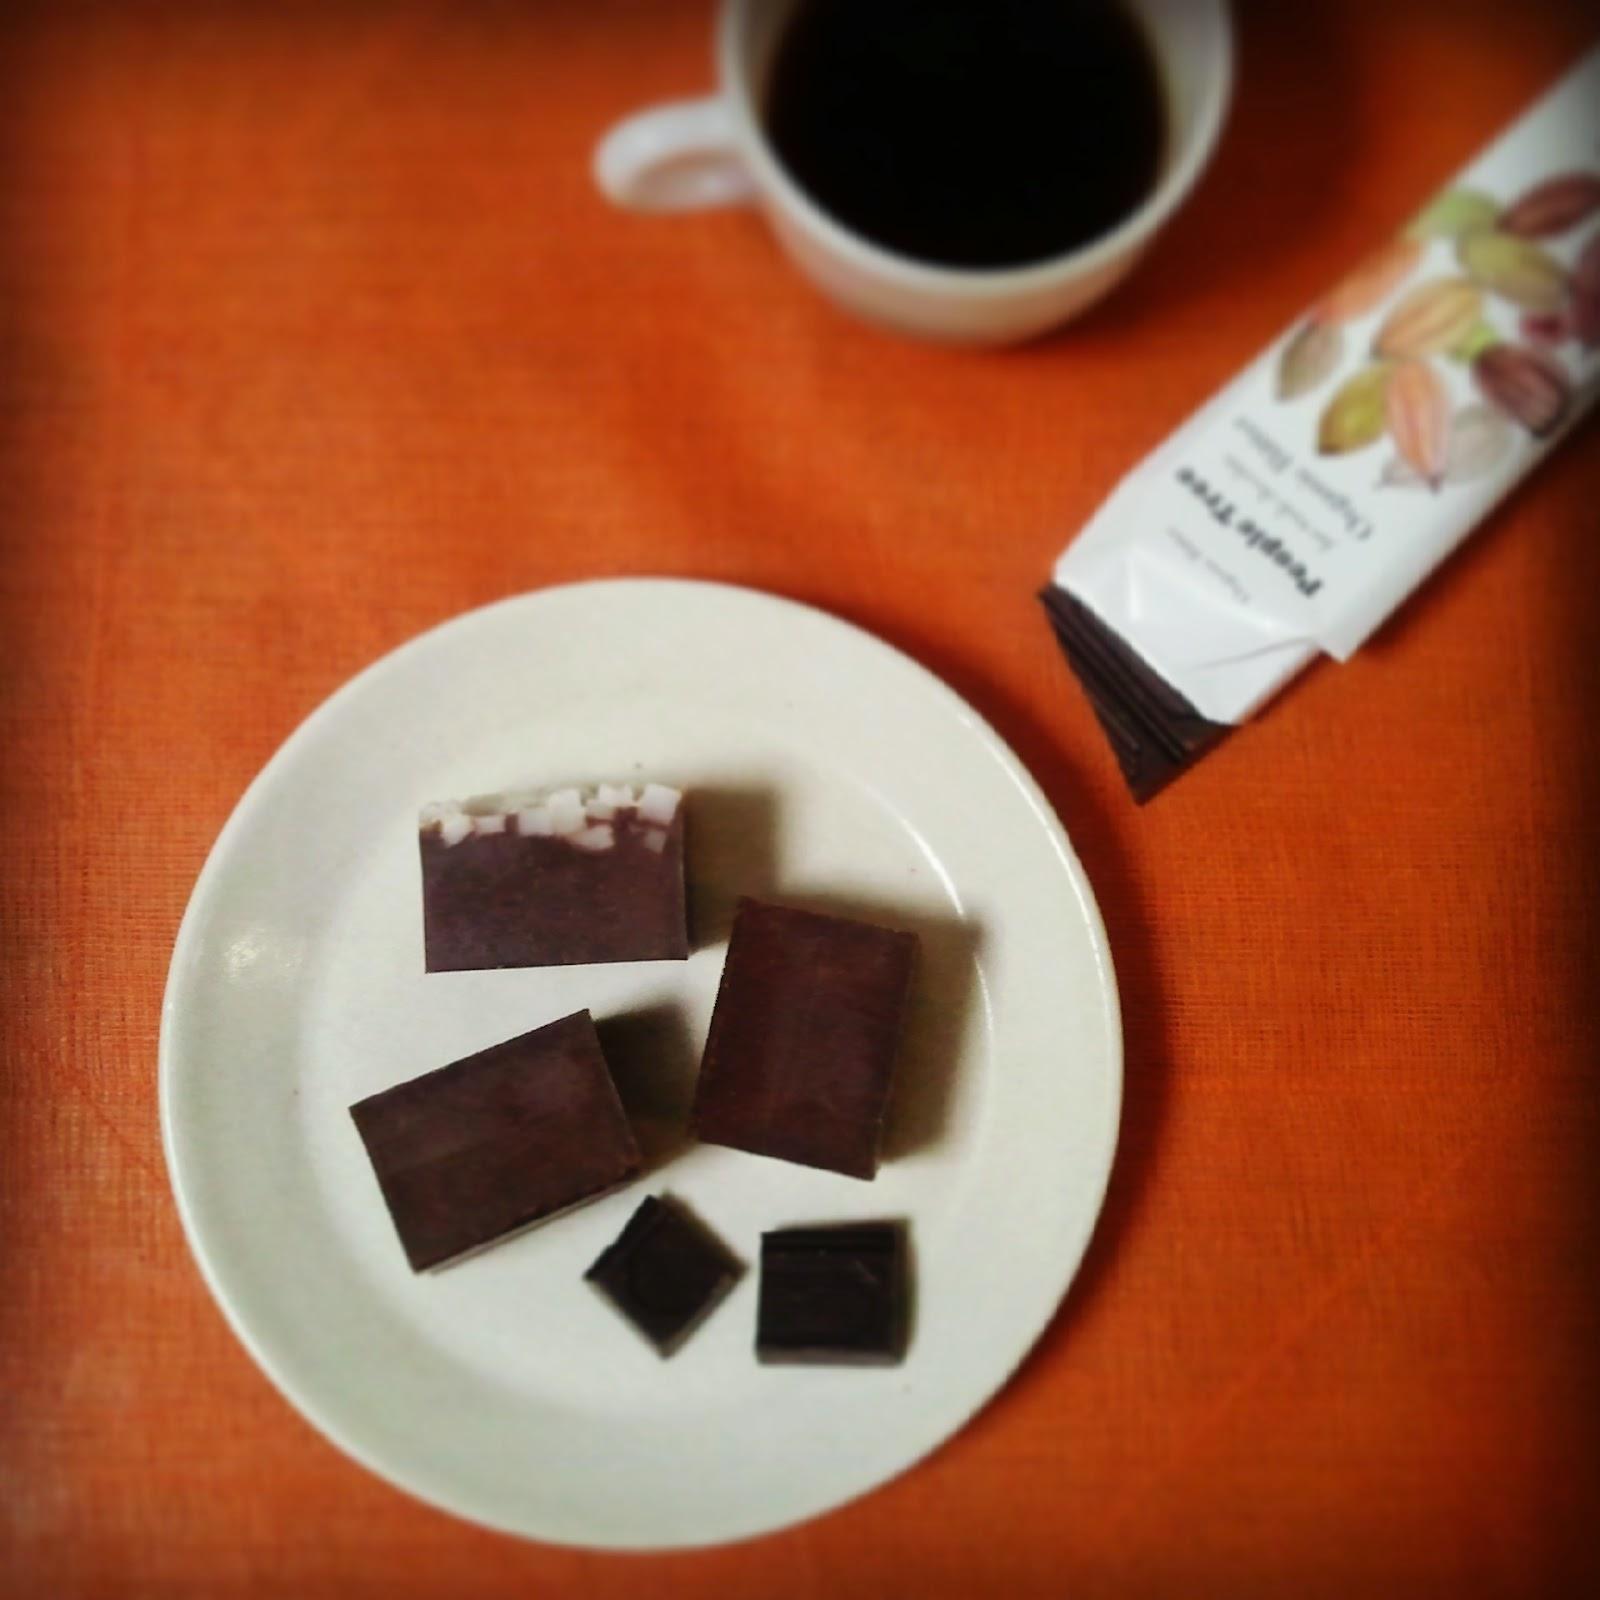 『Chocolate Bars』Rika Shimizu